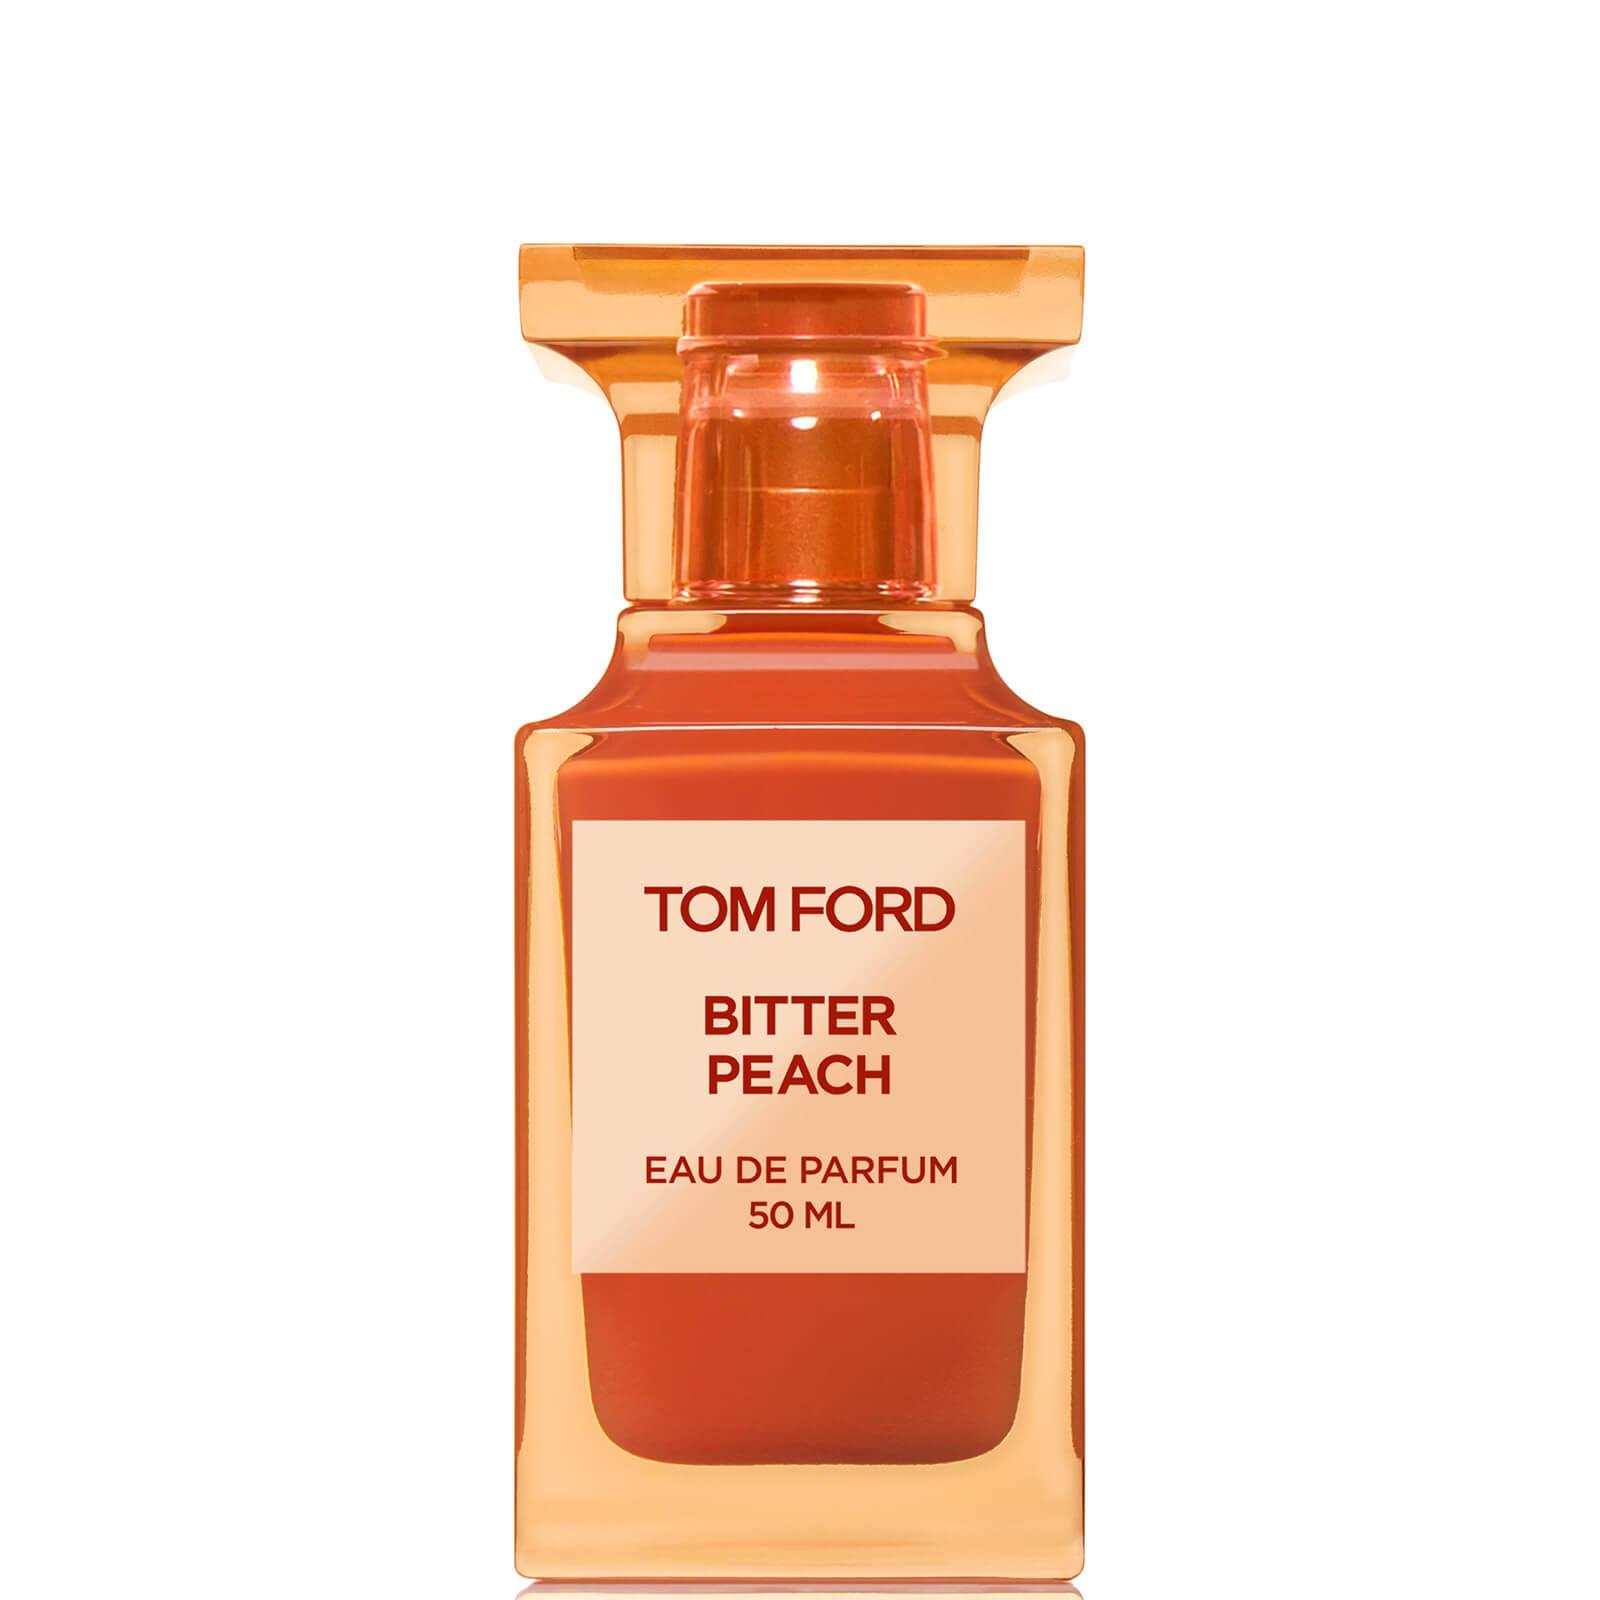 Tom Ford Bitter Peach Eau de Parfum (Various Sizes) - 50ml